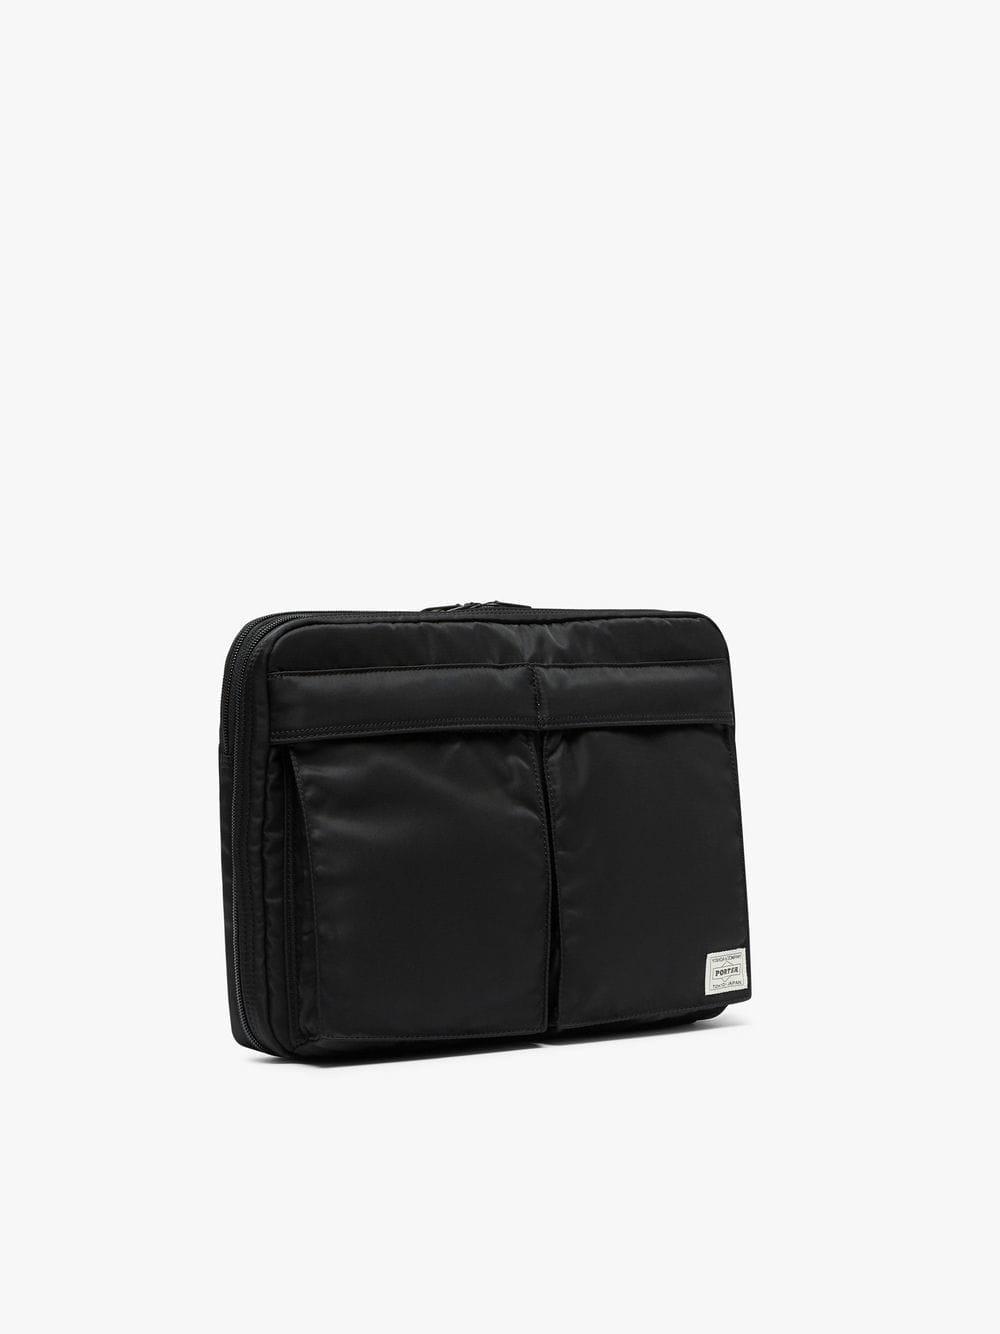 c72326d446a4 Lyst - Mackintosh Black X Shepard Check Porter A4 Clutch Bag in Black